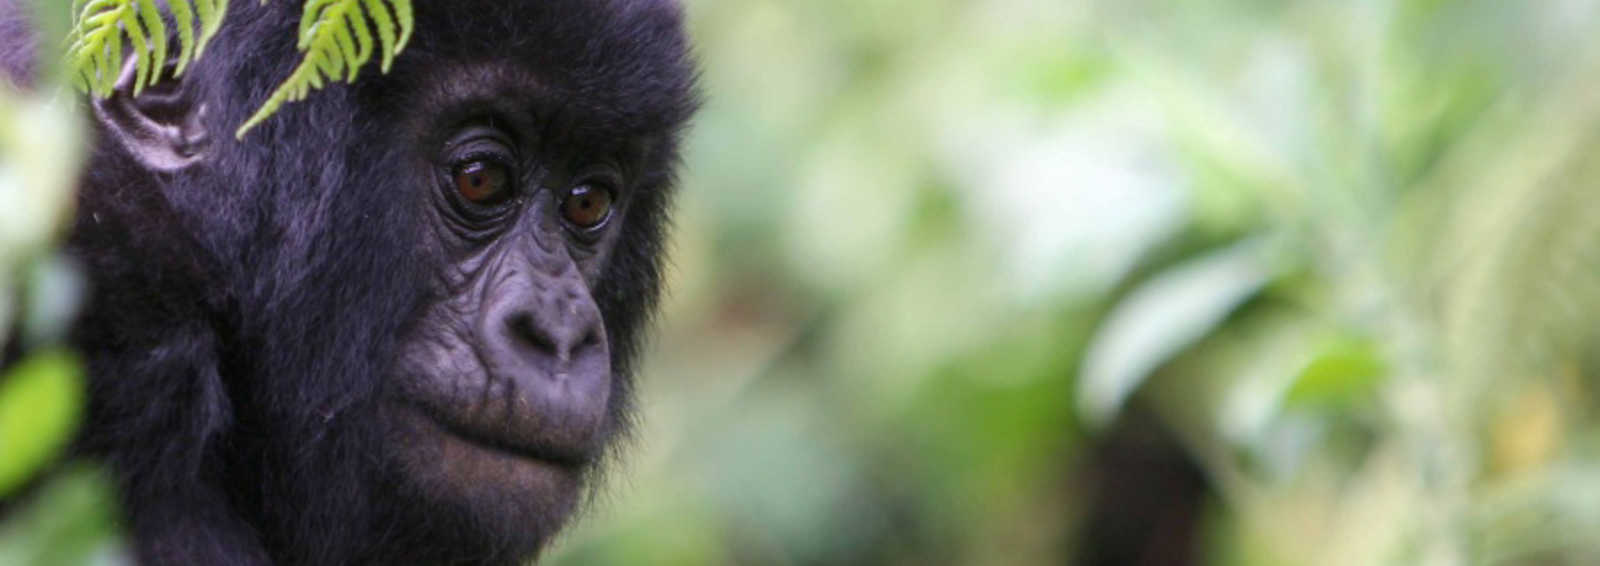 Gorilla in Virunga Mountains, Rwanda